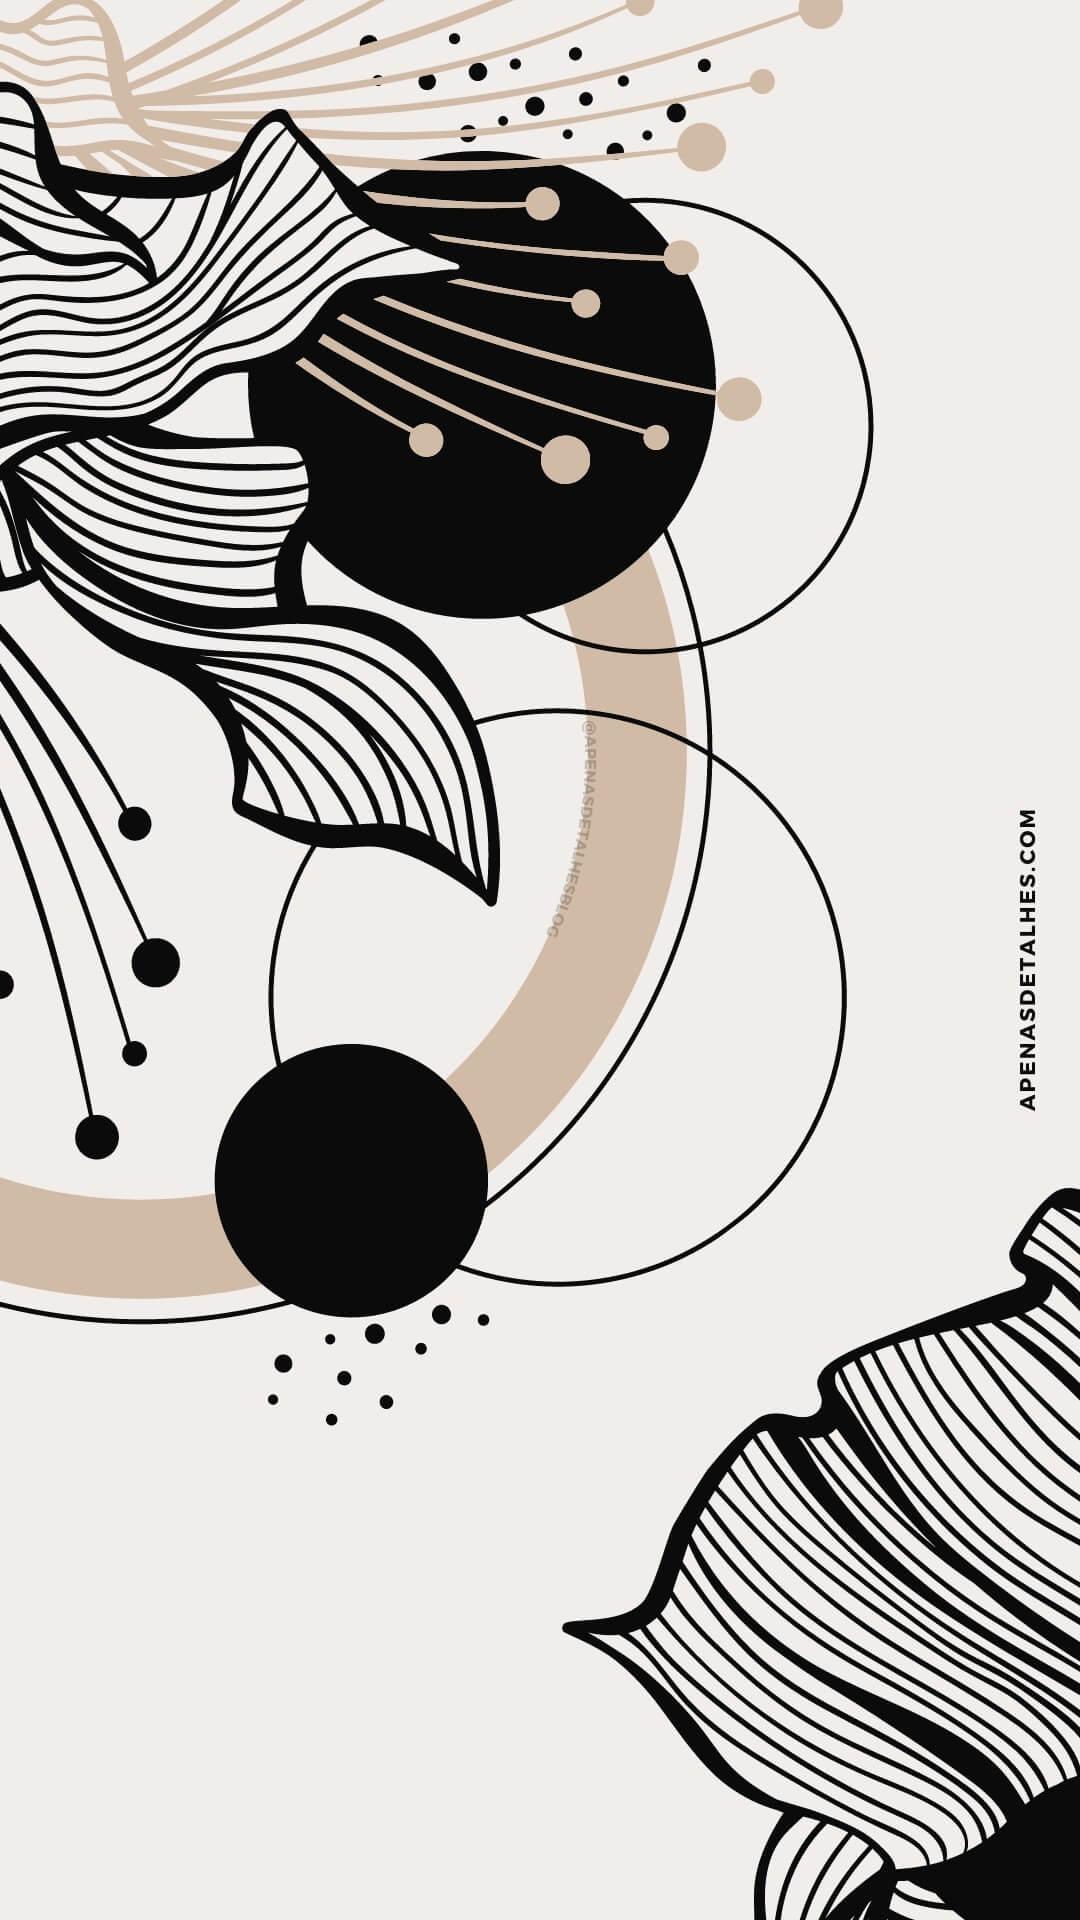 Wallpapers minimalistas grátis para celular